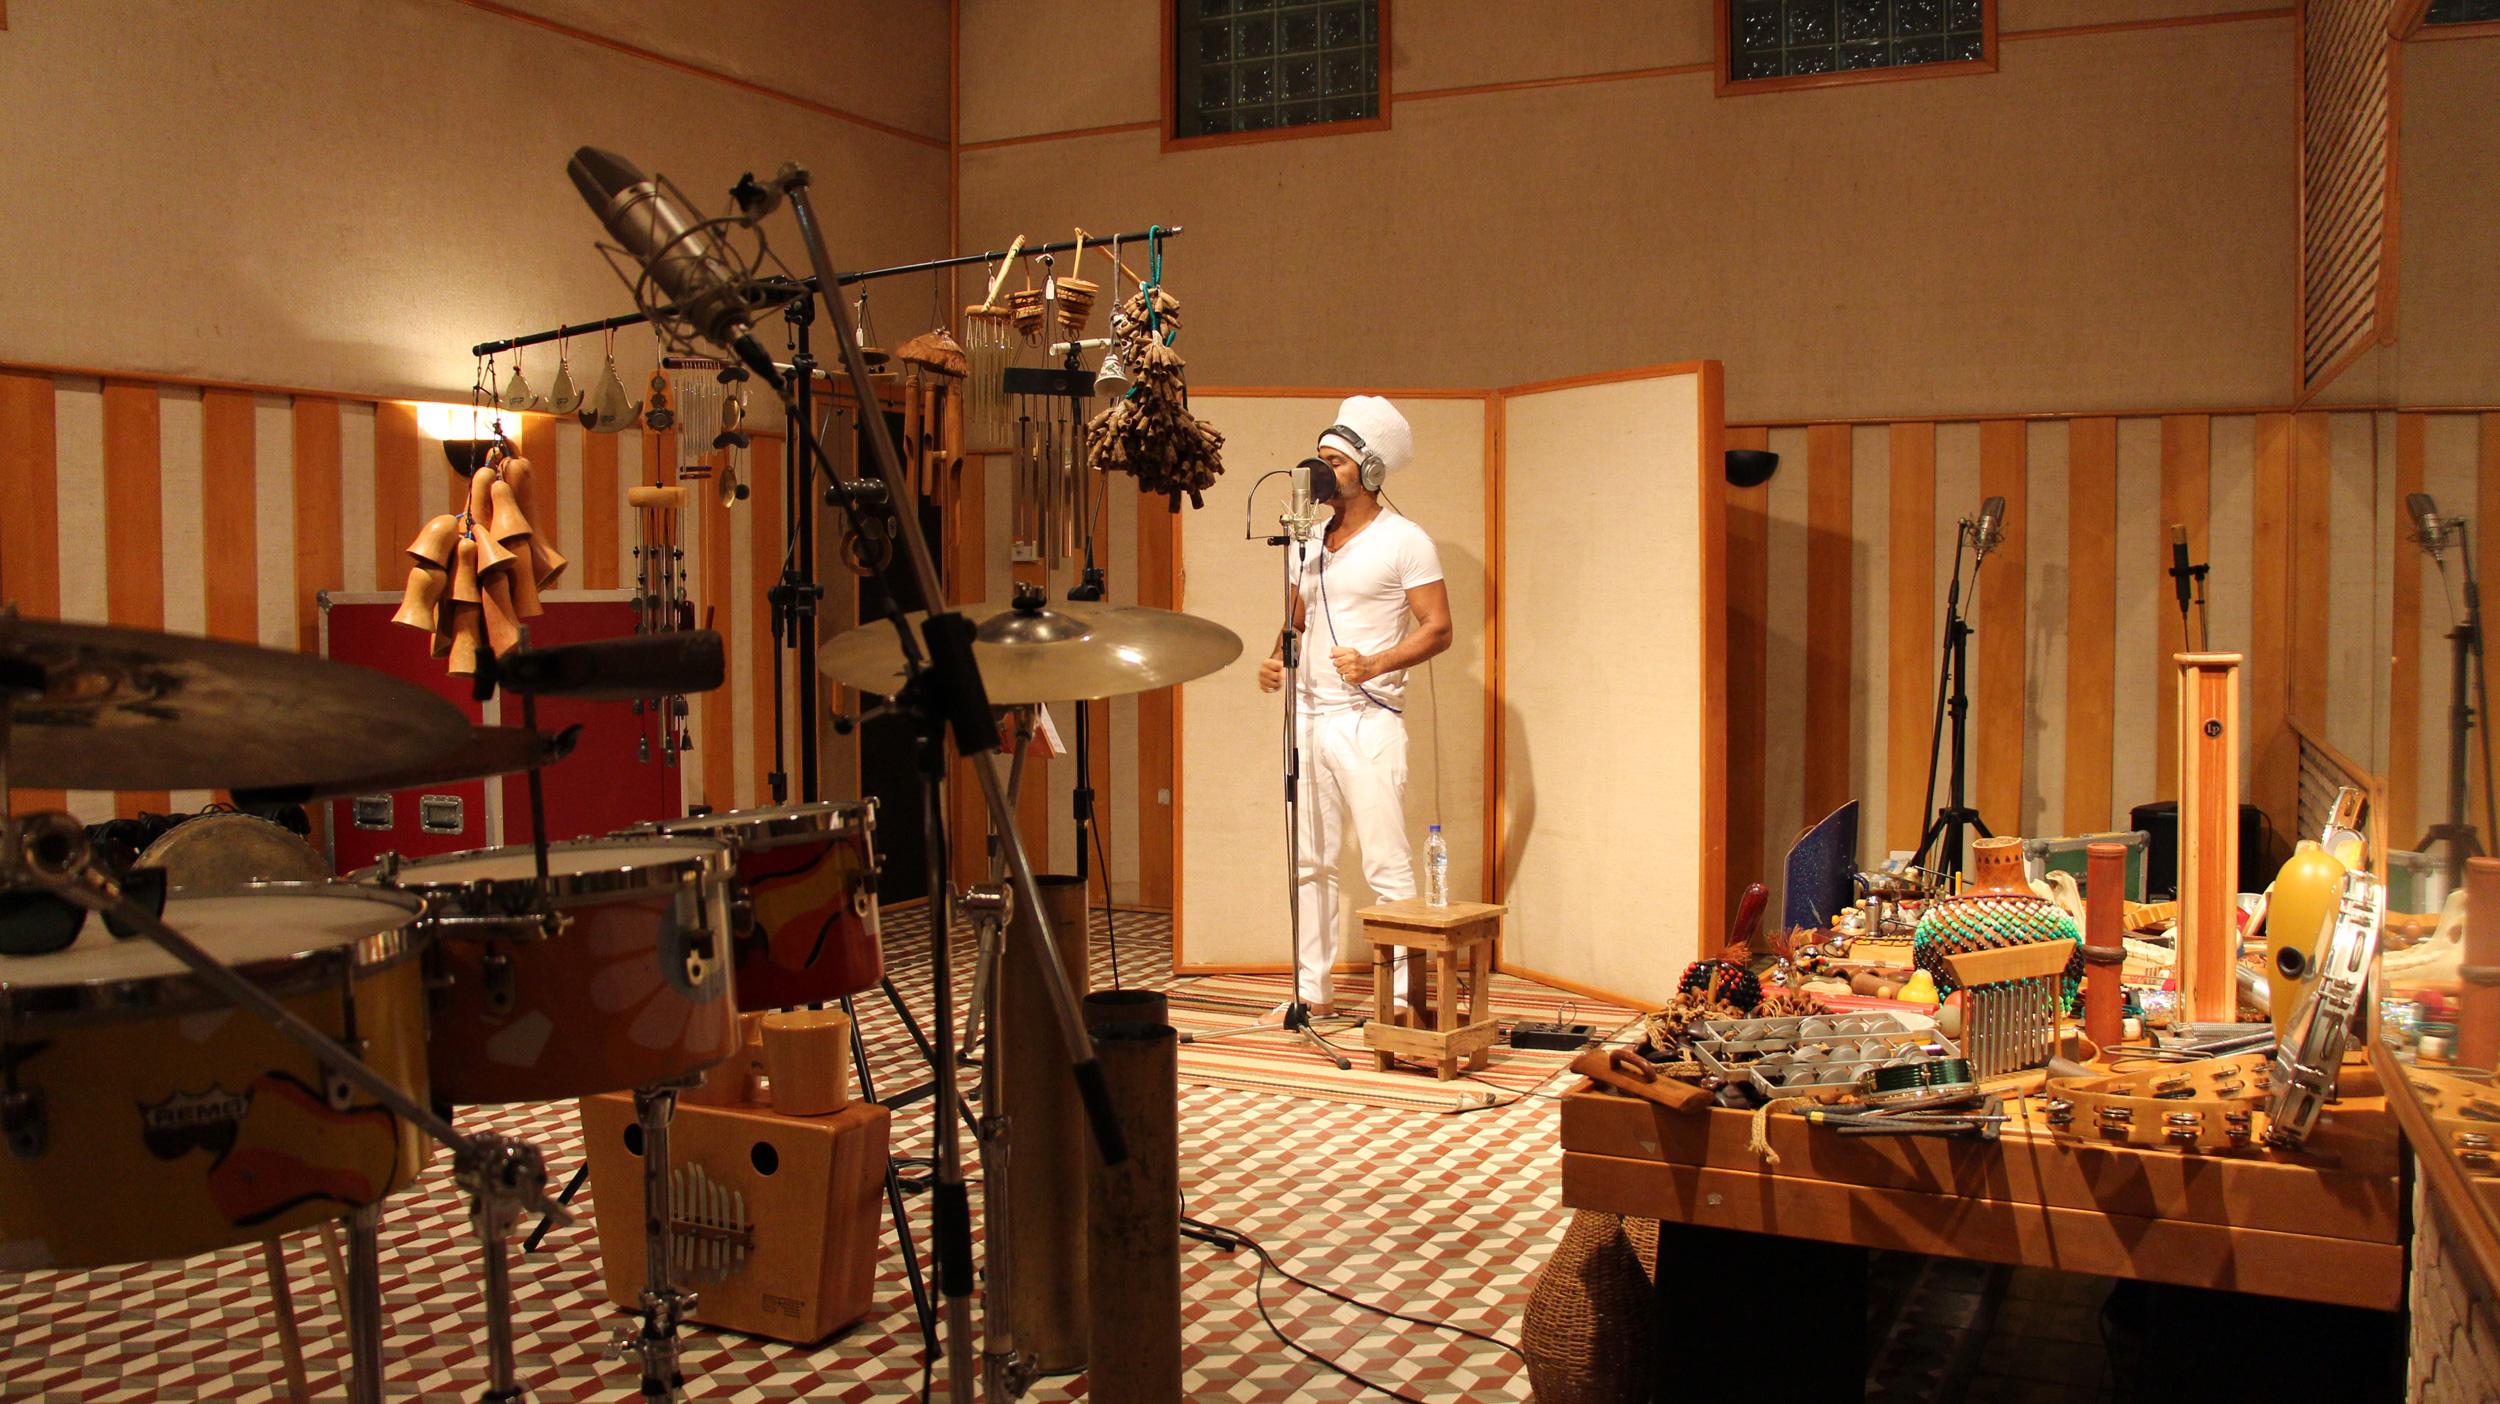 The famous musician Carlinhos Brown in the music recording studio. ©Diane Luz